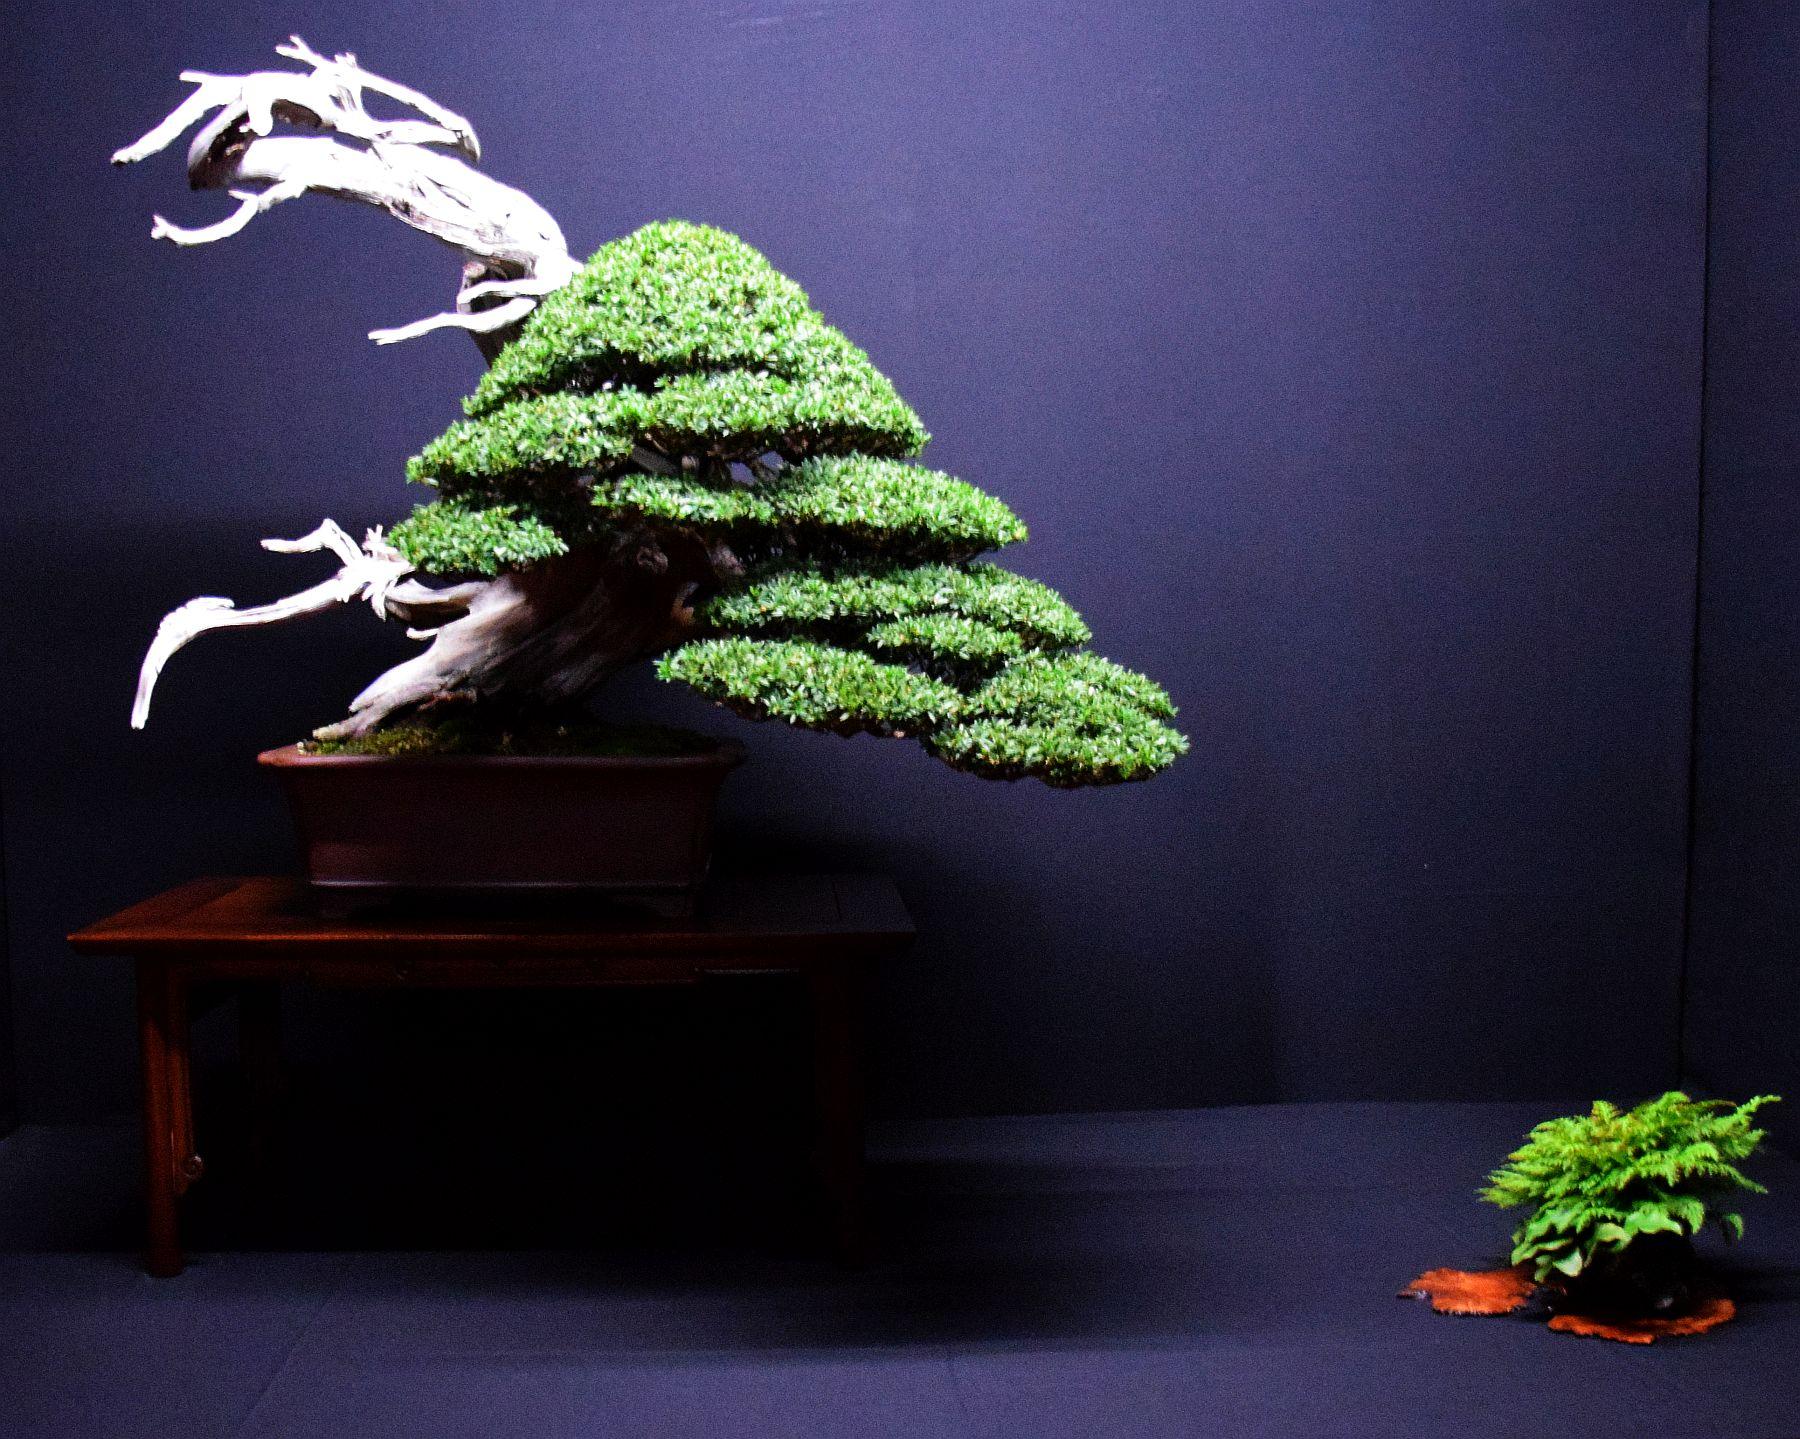 bonsai-museum-luis-vallejo-026